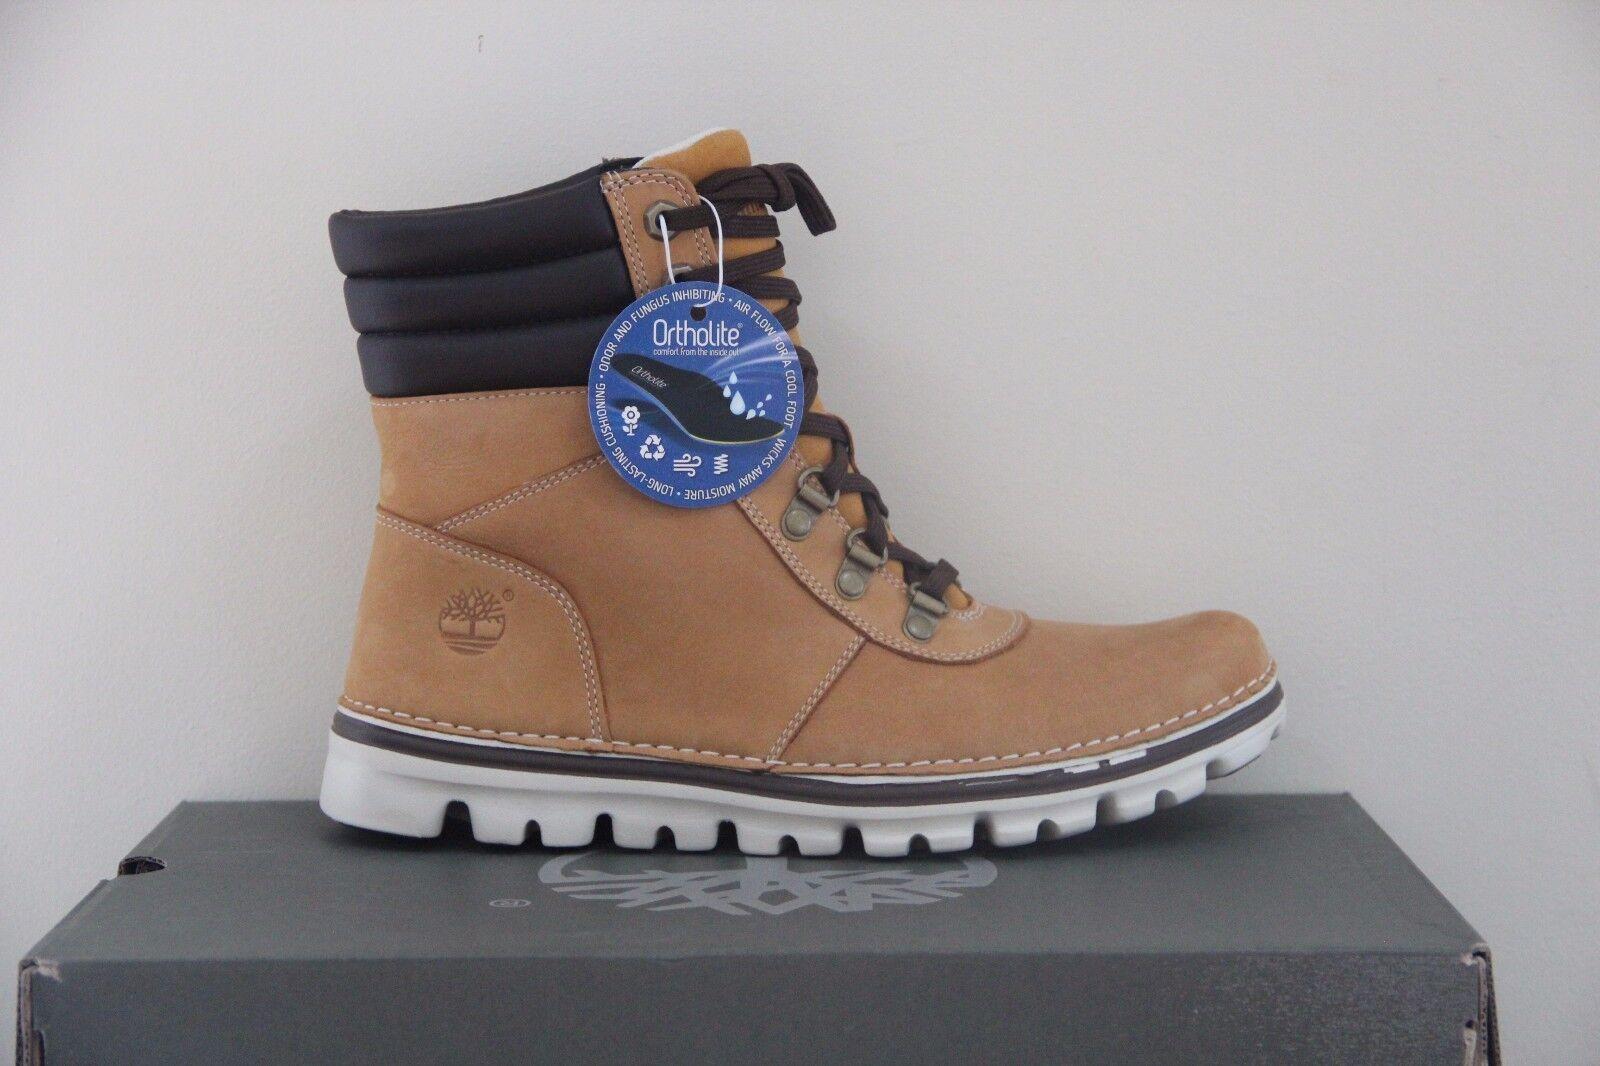 Timberland Women's Conant 6 inch Lightweight Boots Wheat